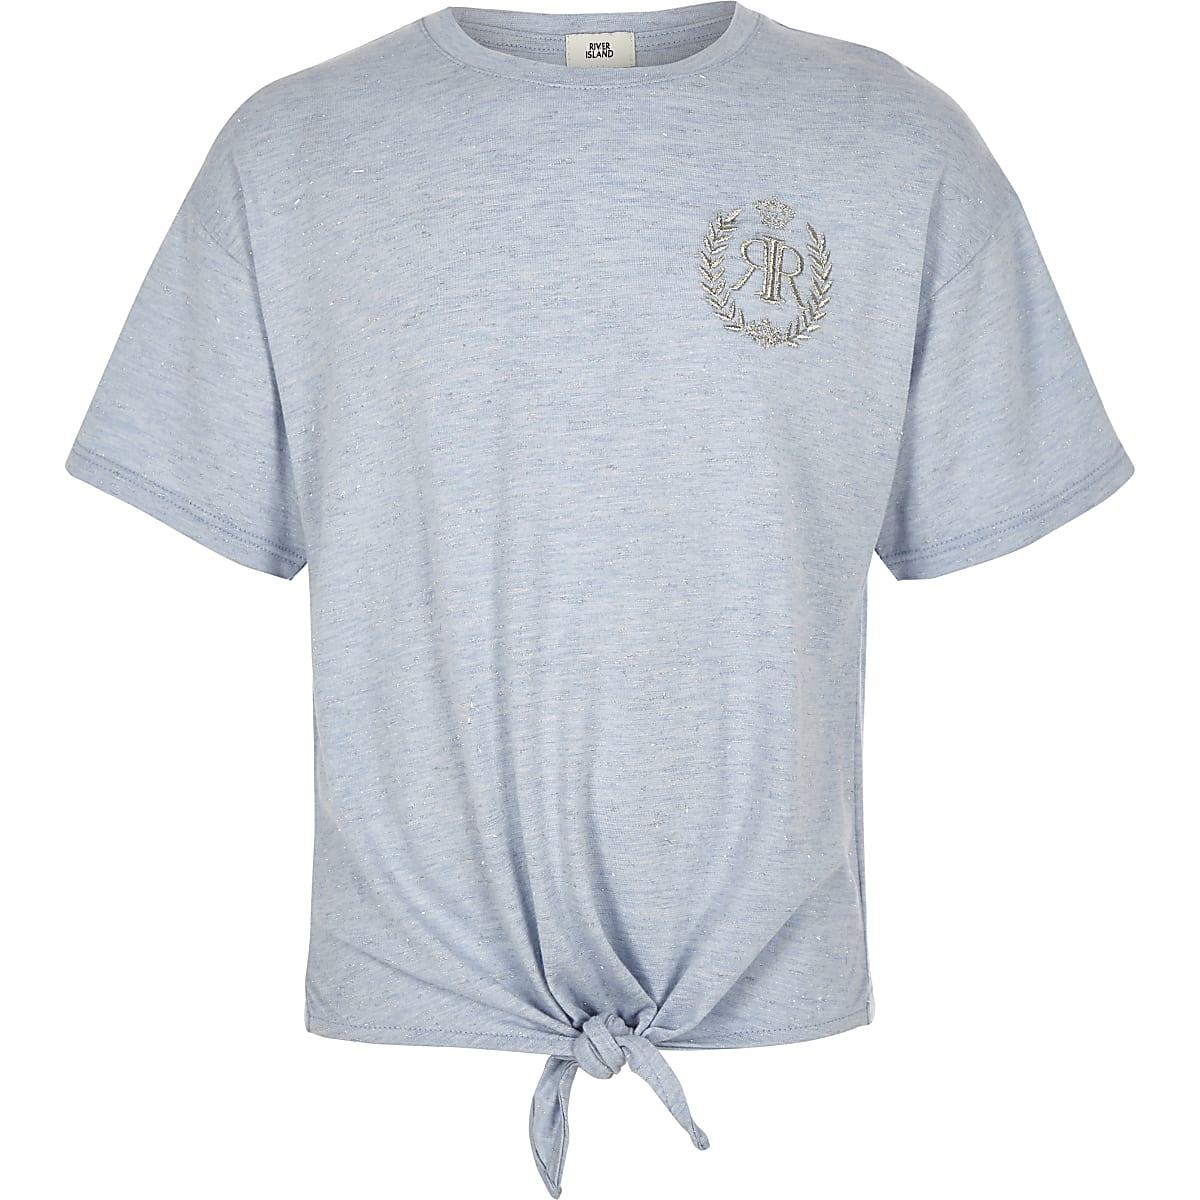 Girls blue RI tie front T-shirt